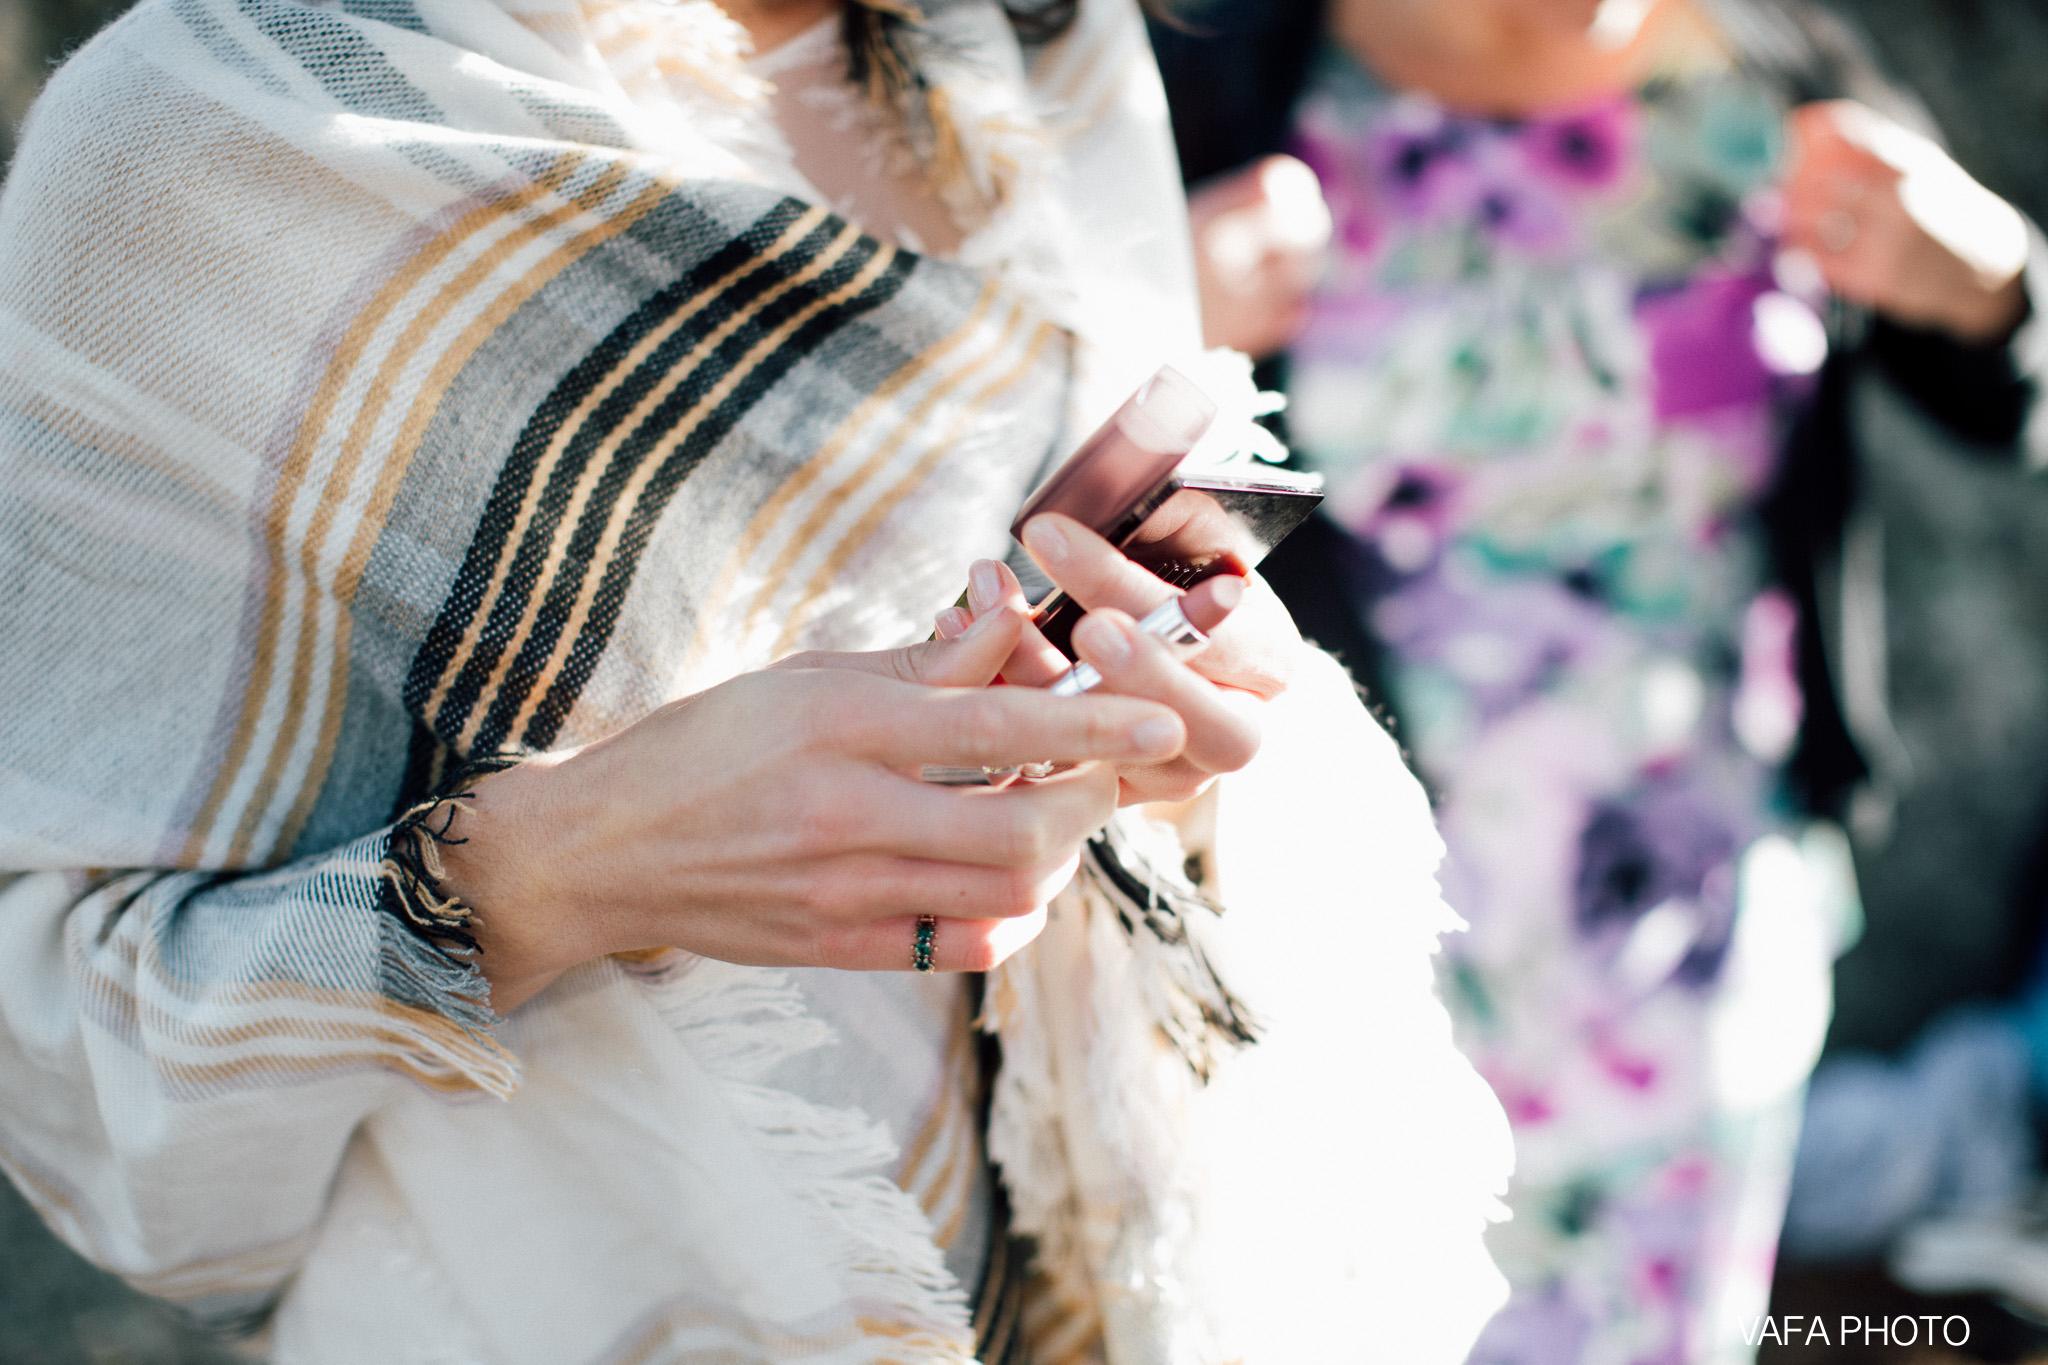 Hogback-Mountain-Wedding-Chelsea-Josh-Vafa-Photo-97.jpg